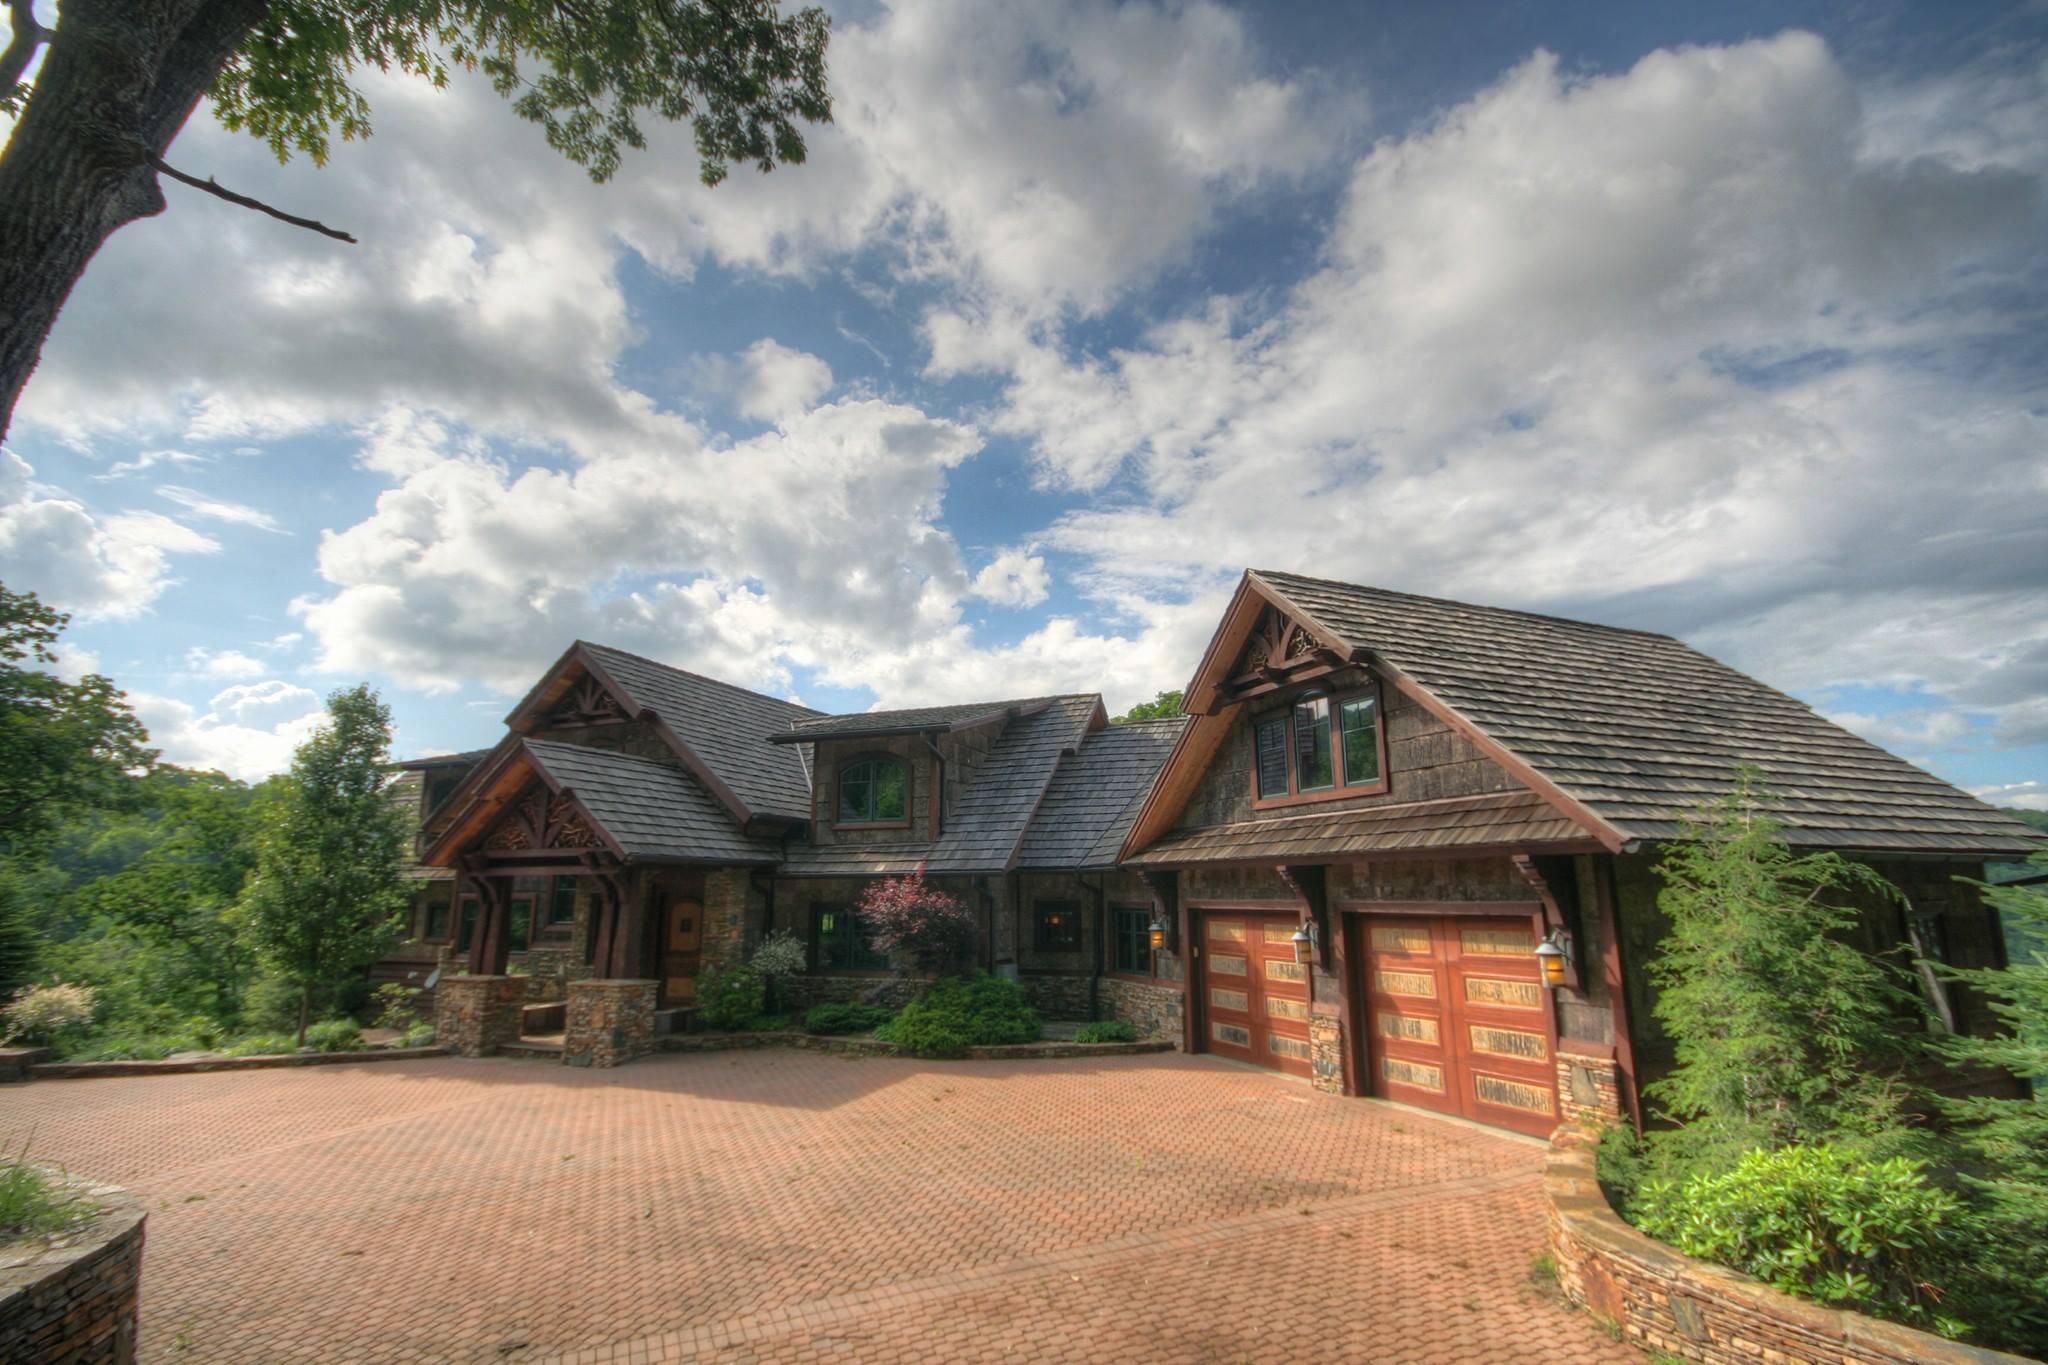 Carolina-Cabin-Rentals-Boone-North-Carolina-Rental-Property